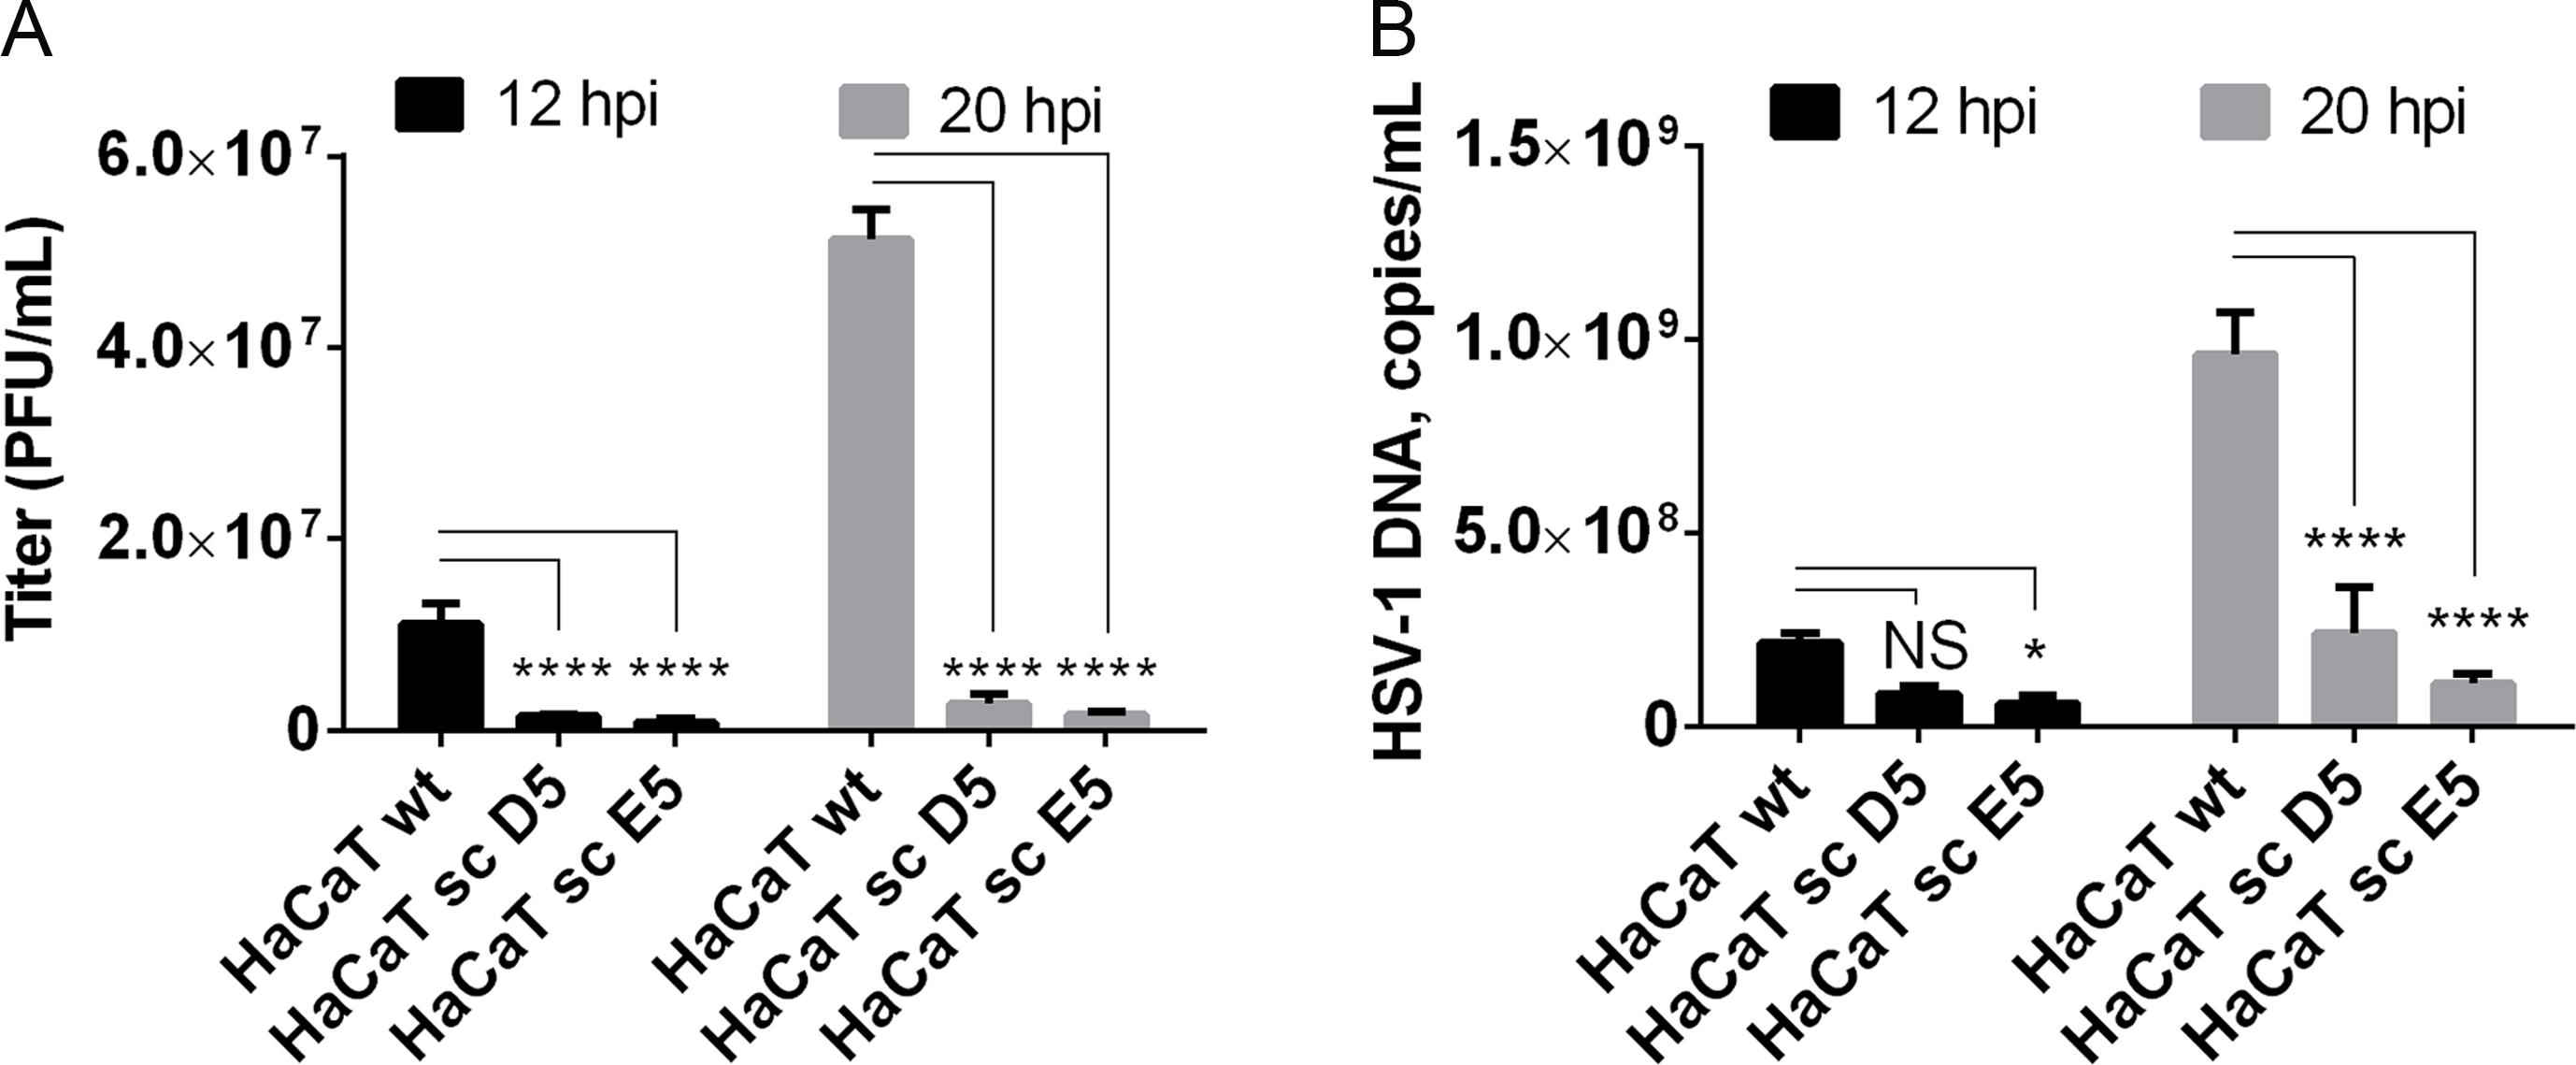 Elongation of O-linked glycans affects HSV-1 secretion/infectivity.